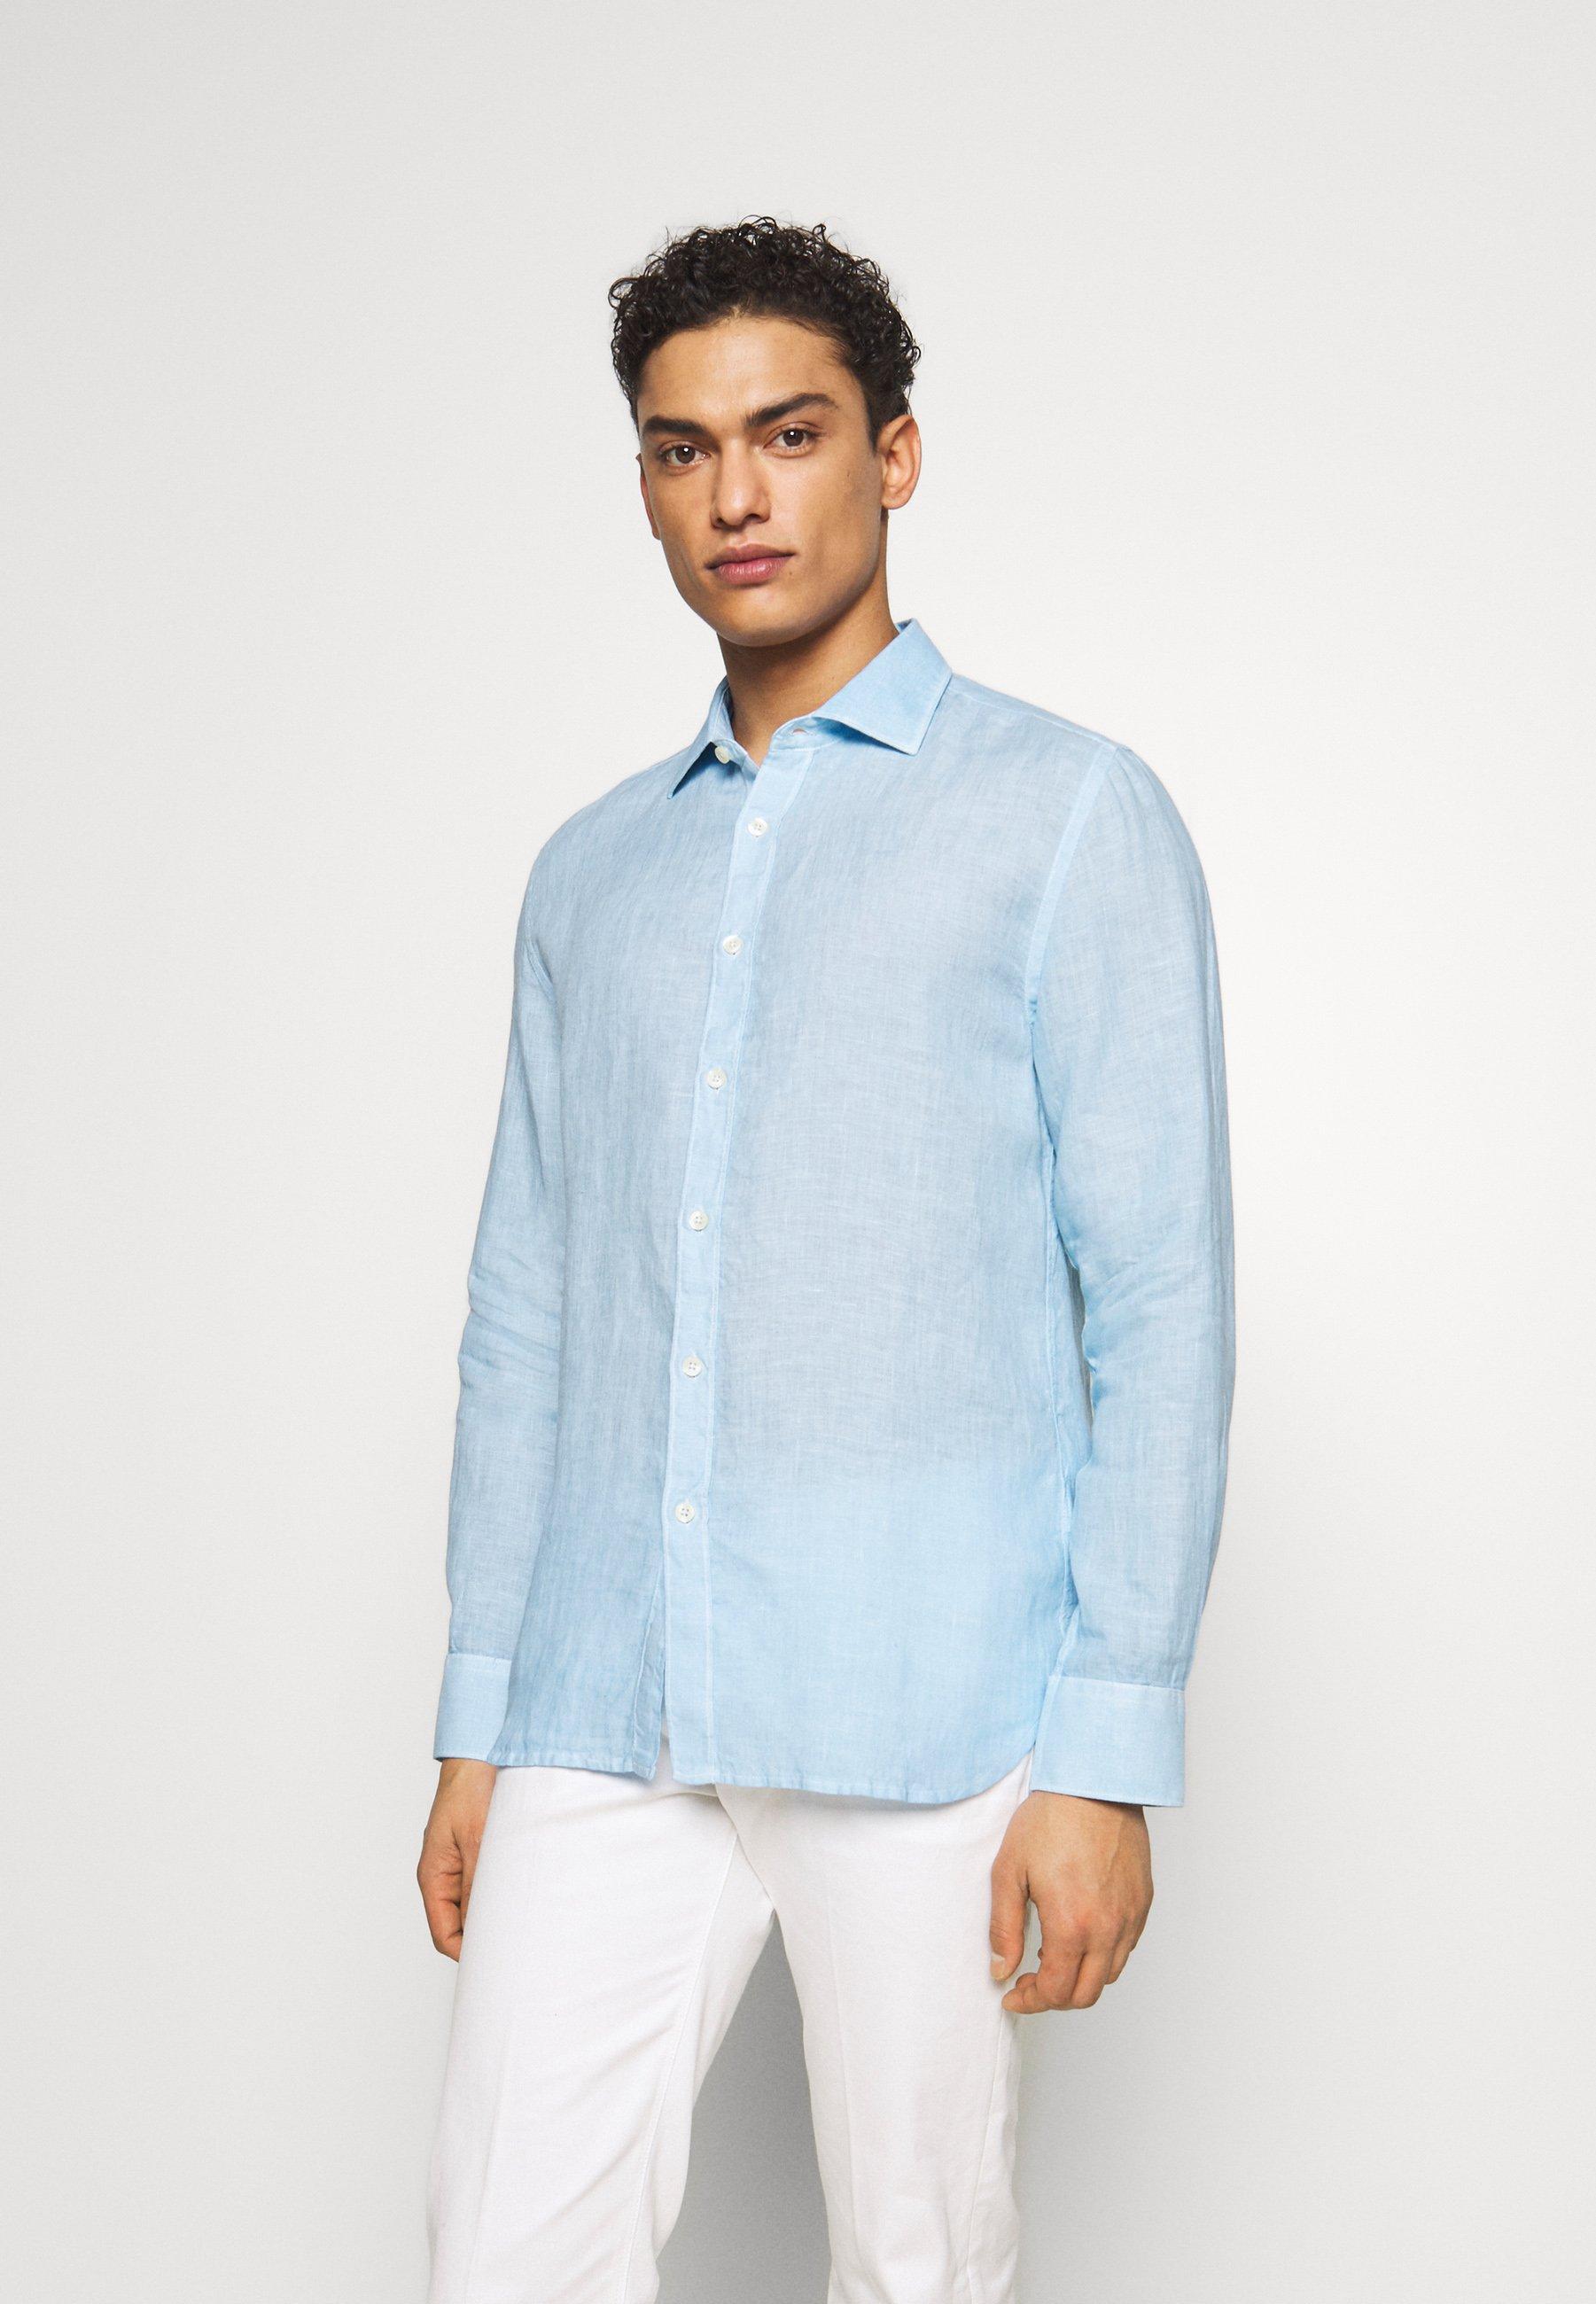 120% Lino Koszula - blue soft fade